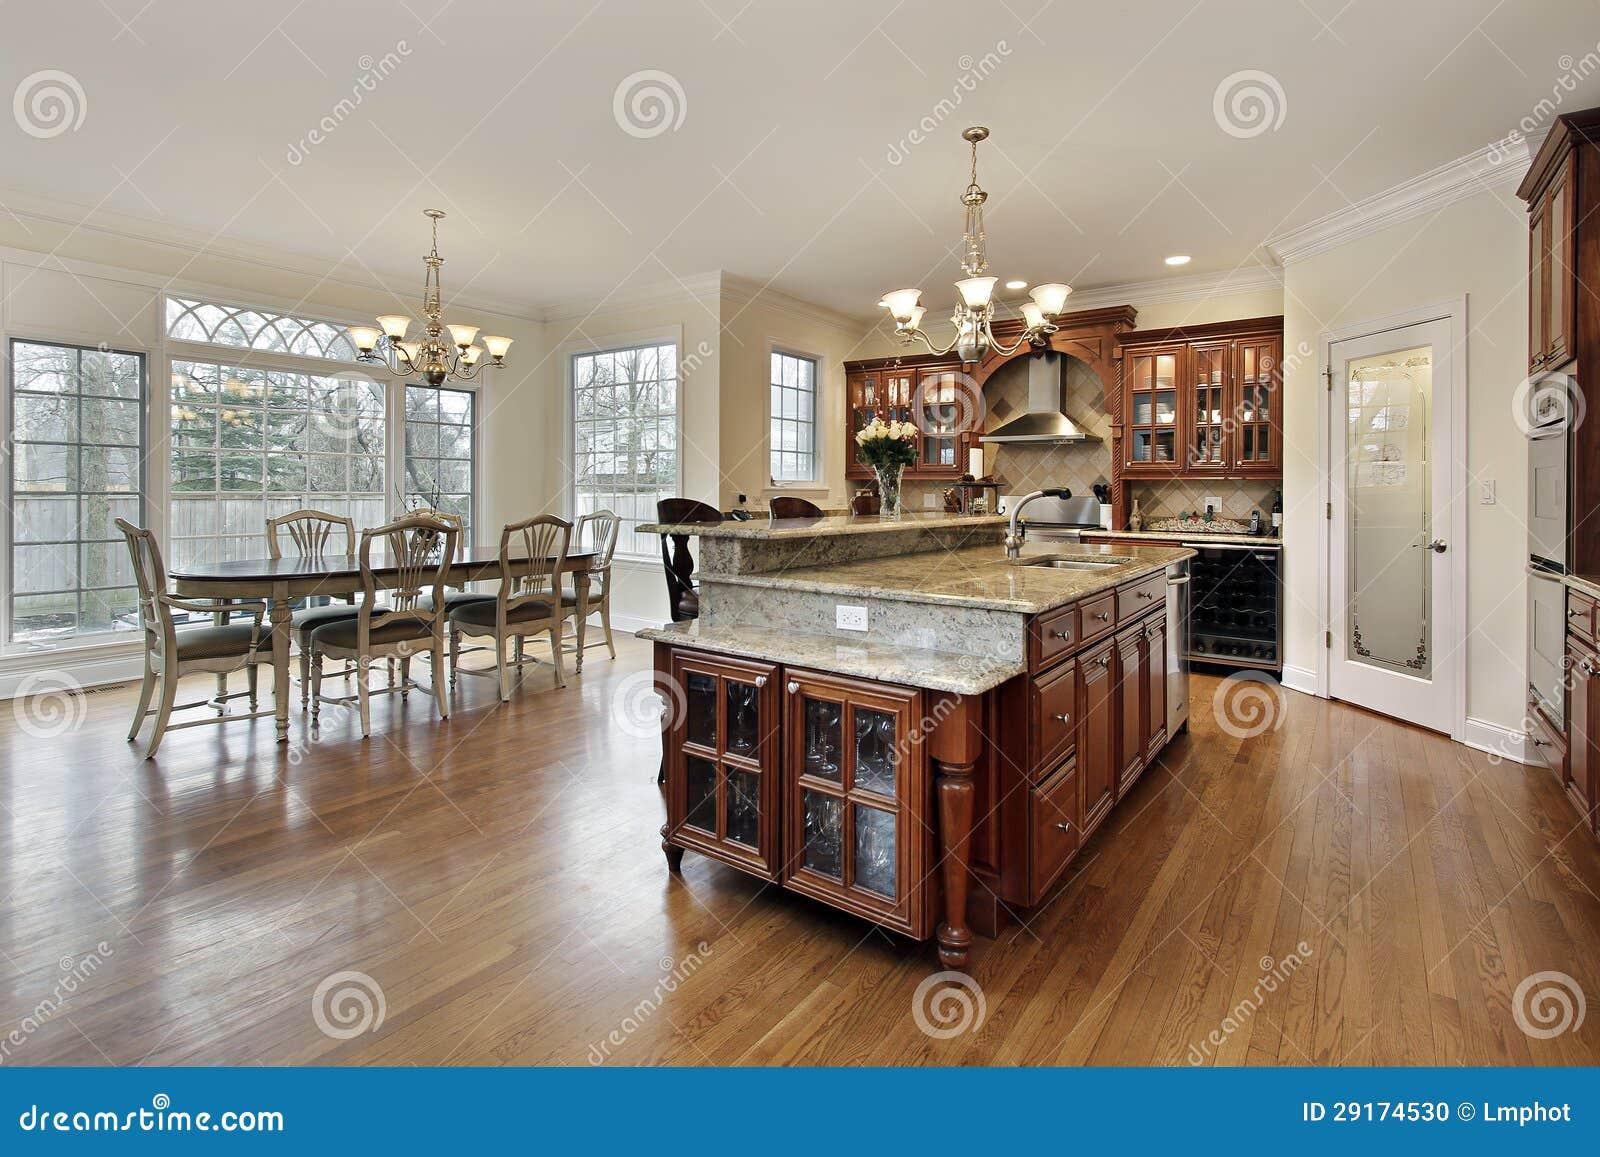 Large Kitchen With Eating Area Stock Photo Image 29174530